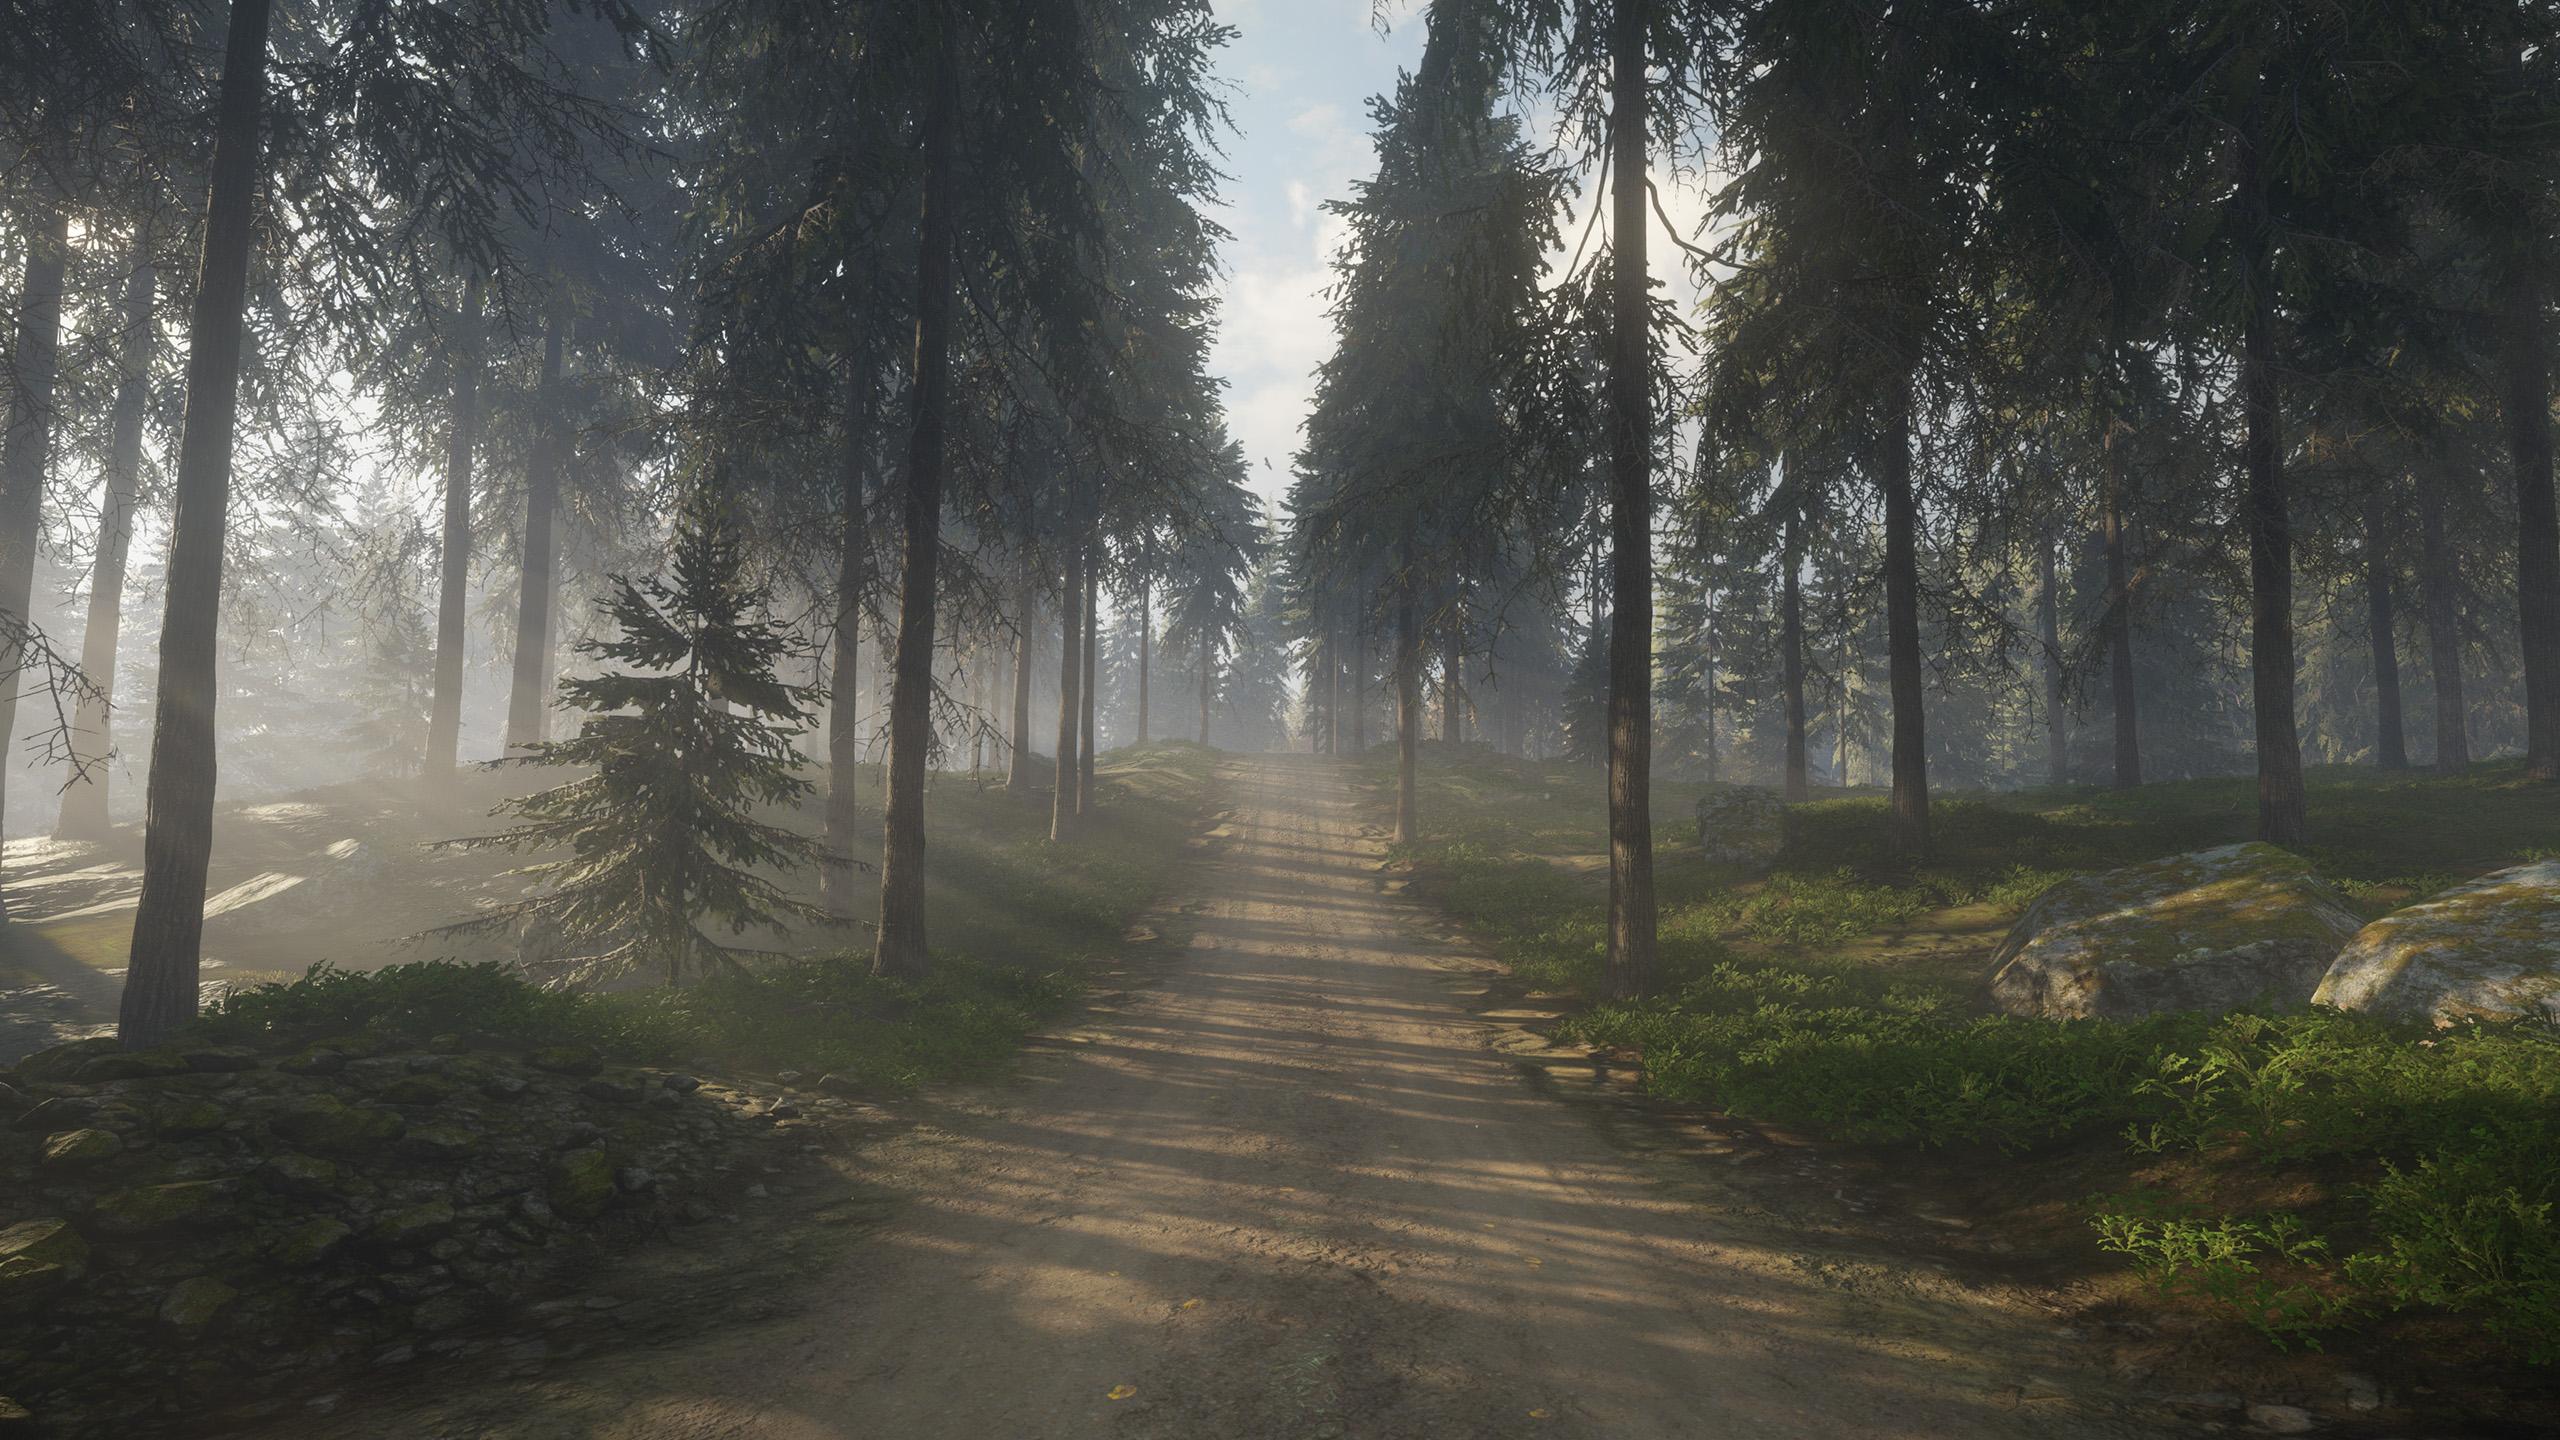 Wallpaper Video Game Art Nature Trees Grass Dirt Road Screen Shot 2560x1440 Toomy115 1905751 Hd Wallpapers Wallhere